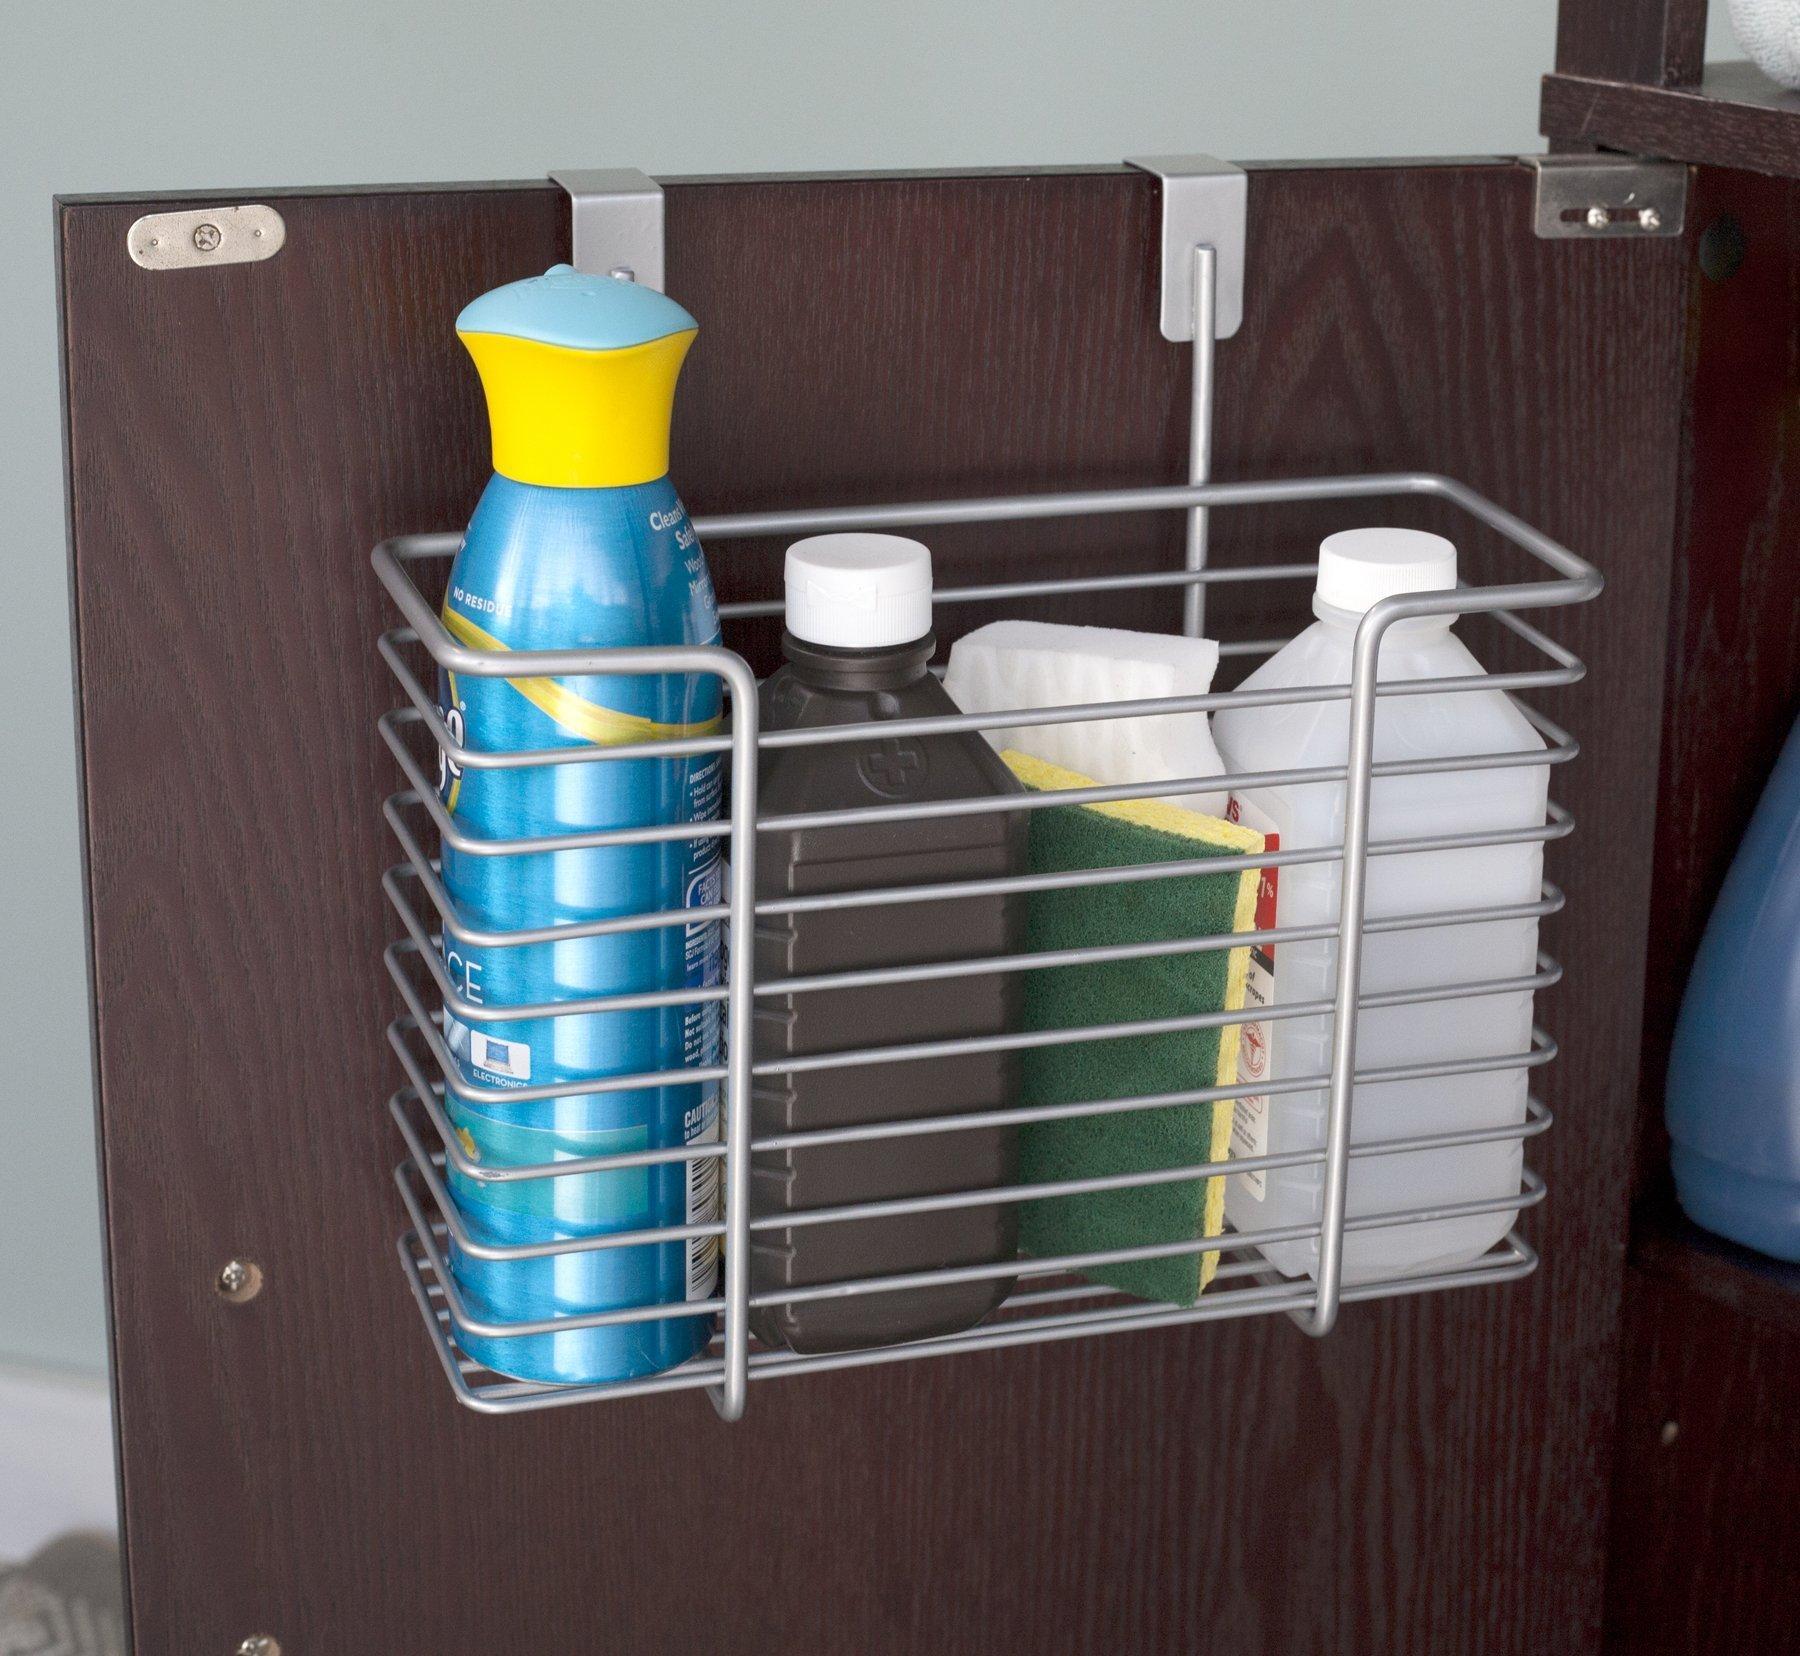 Home Basics Over the Cabinet Basket Organizer (Large) [Home]